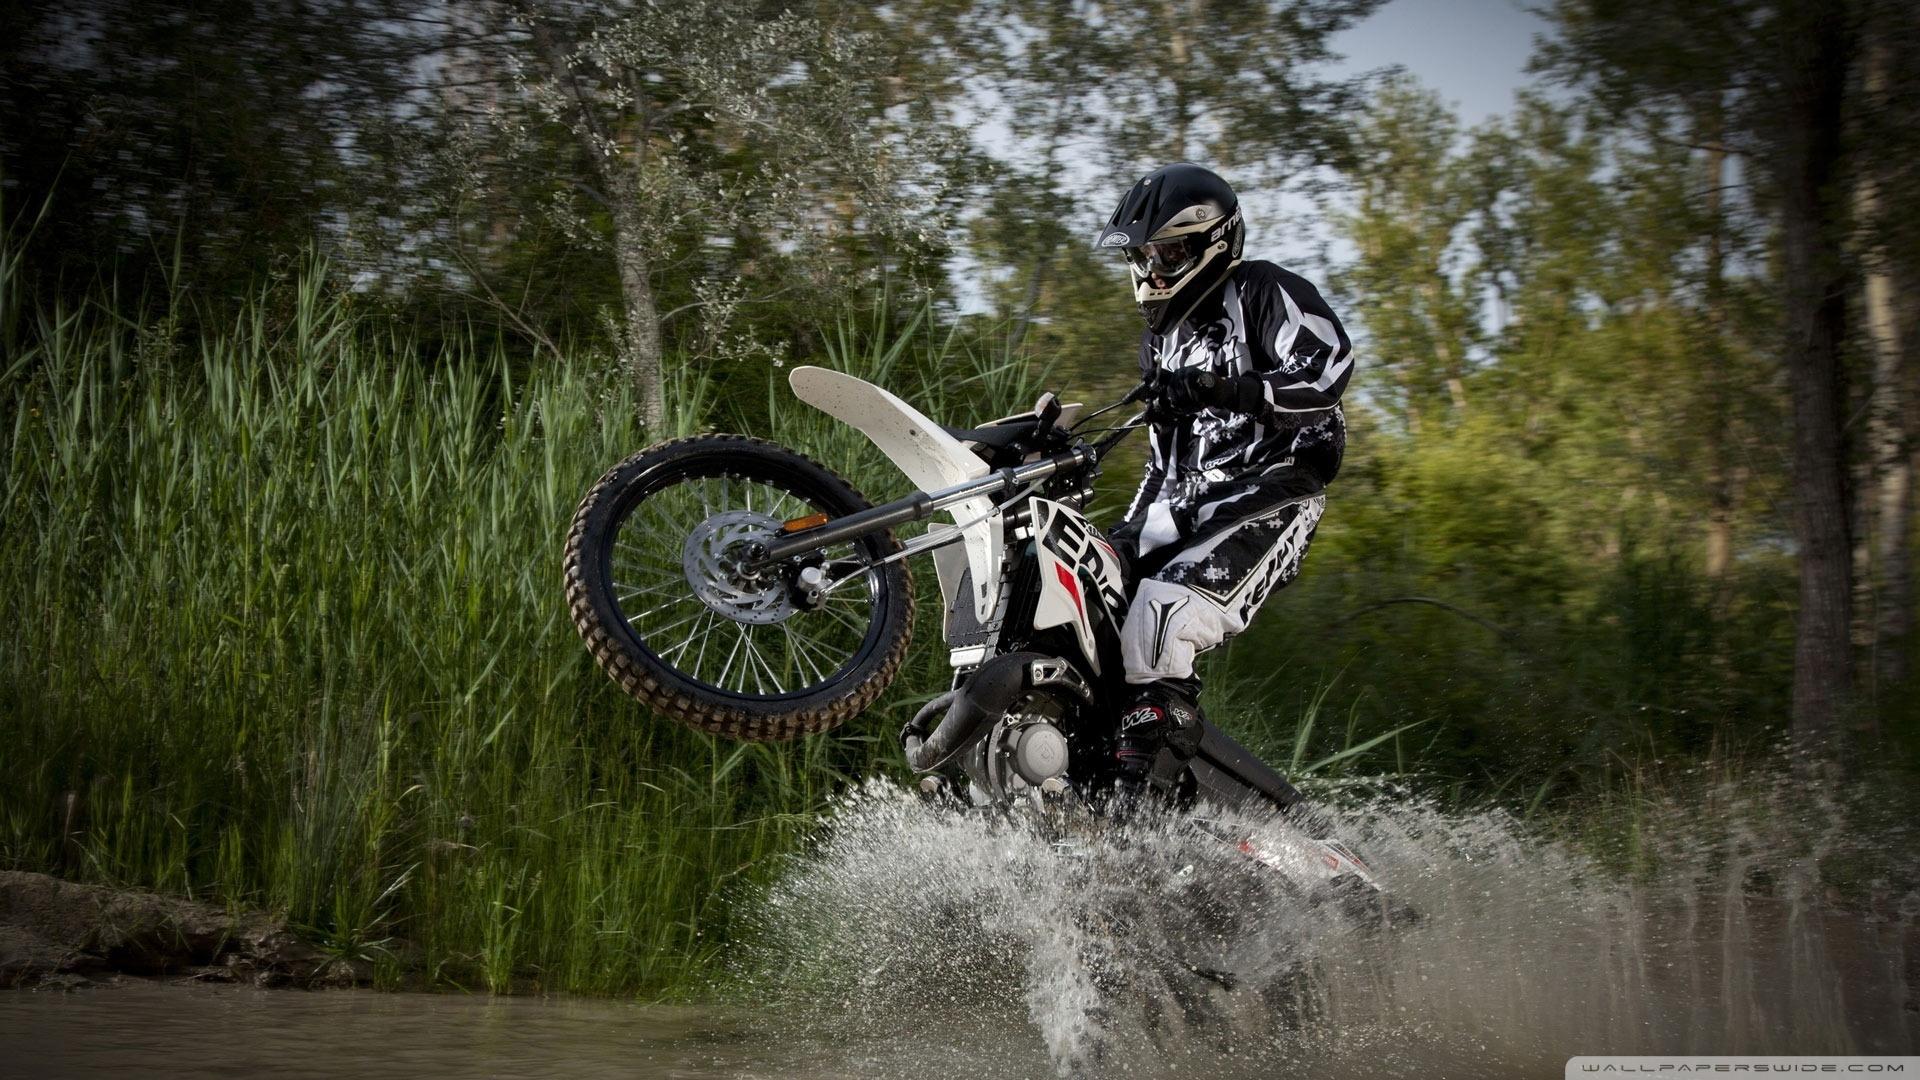 Motocross Sport Wallpaper 1920x1080 Motocross Sport 1920x1080